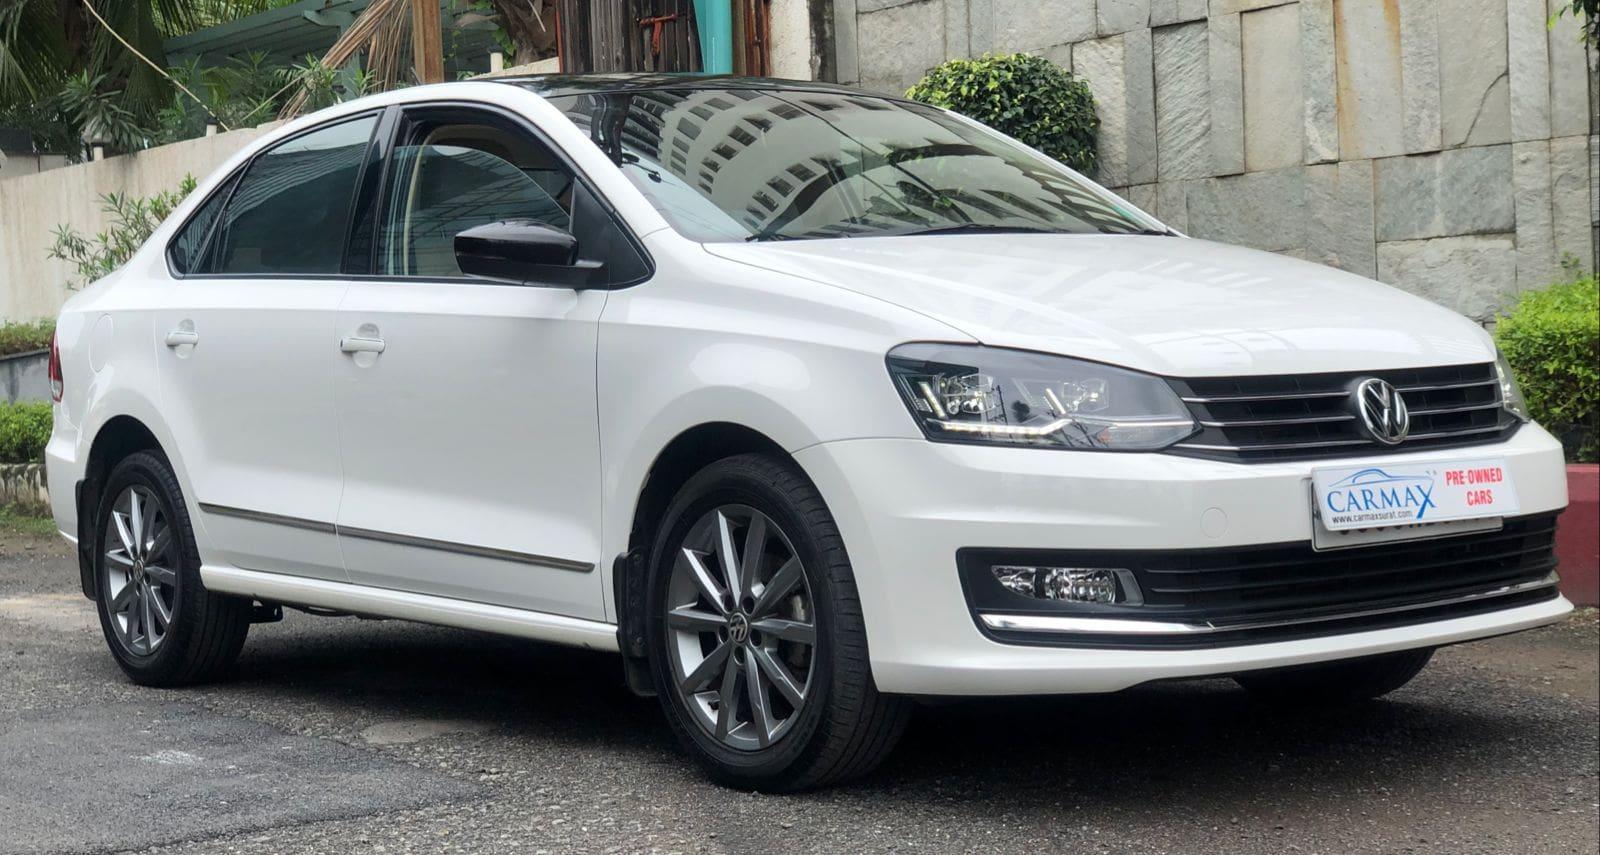 Volkswagen Vento 2015-2019 1.2 Highline Plus AT 16 Alloy